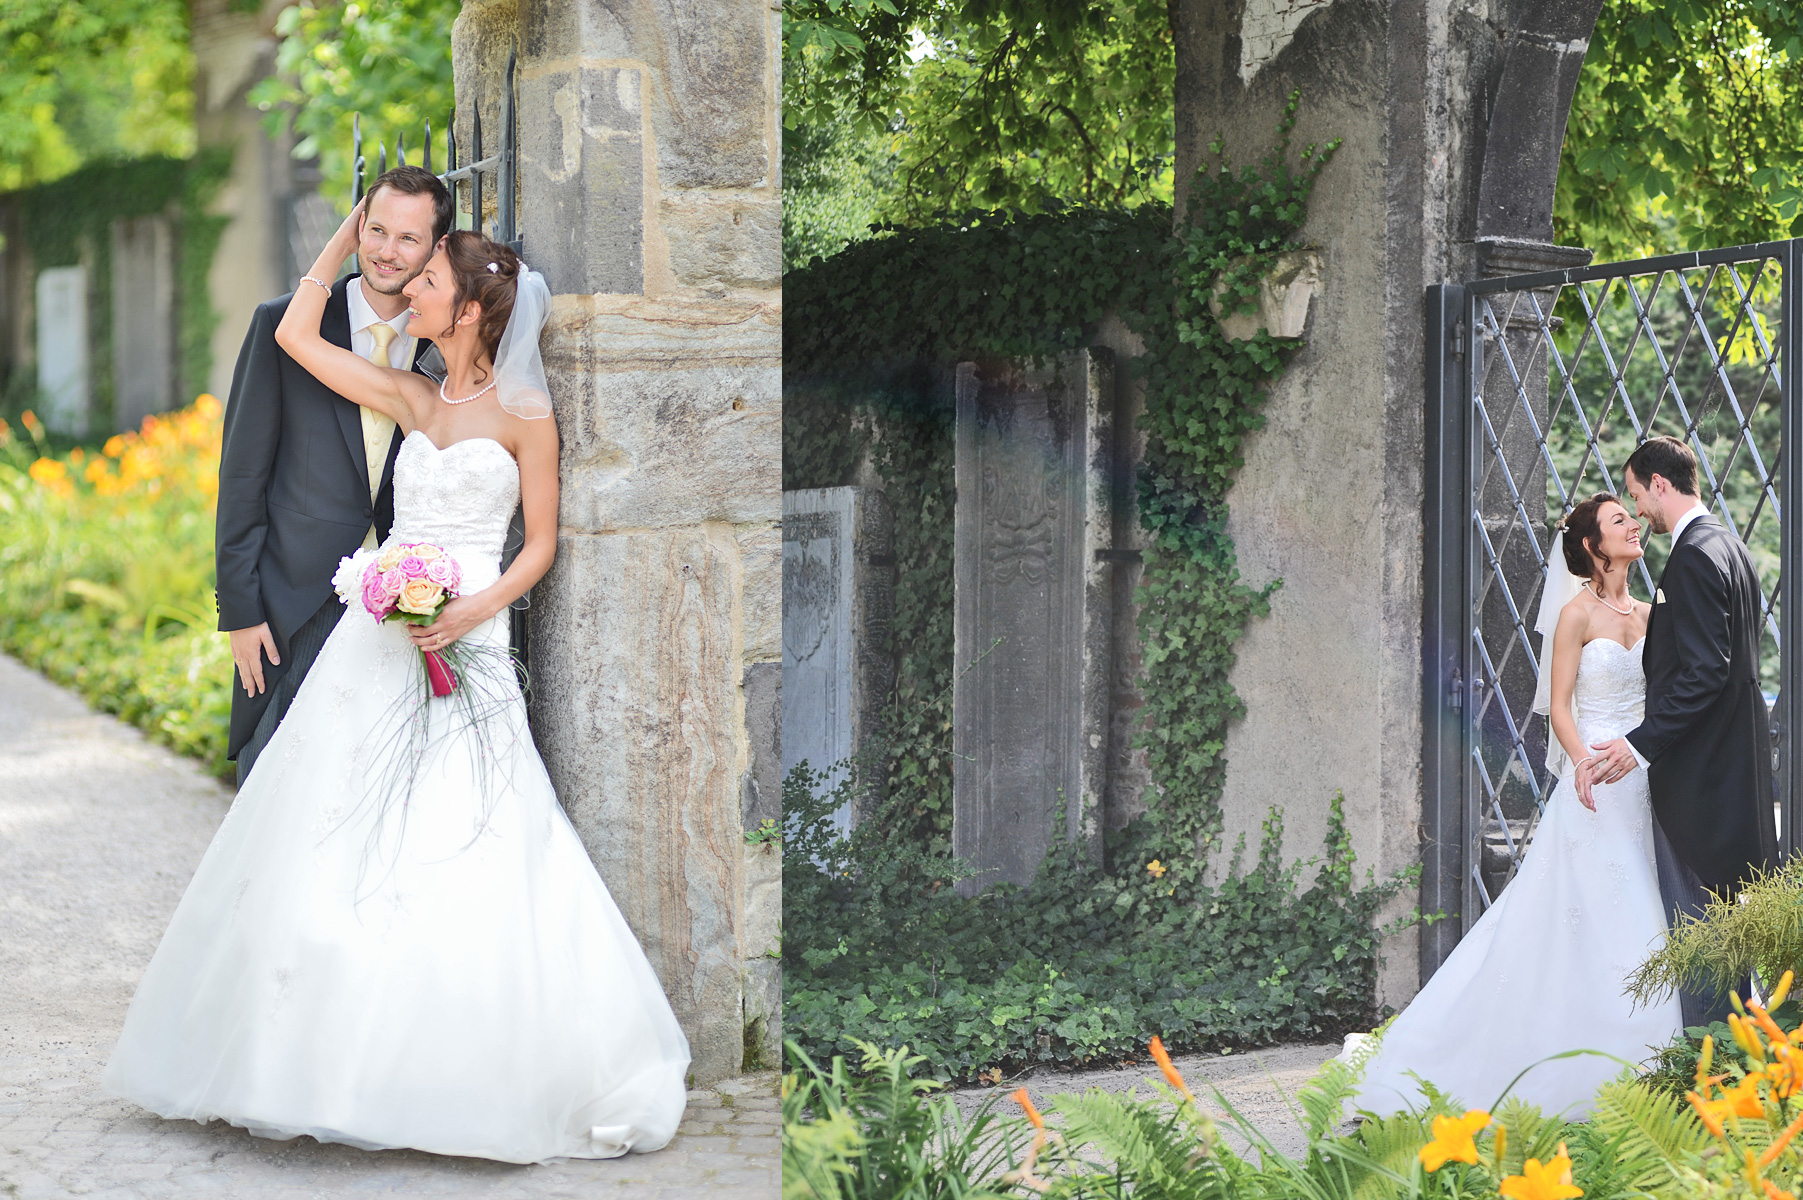 Hochzeitsfotografie-Nicole-Bouillon_Nicole-Bouillon-Fotografie41